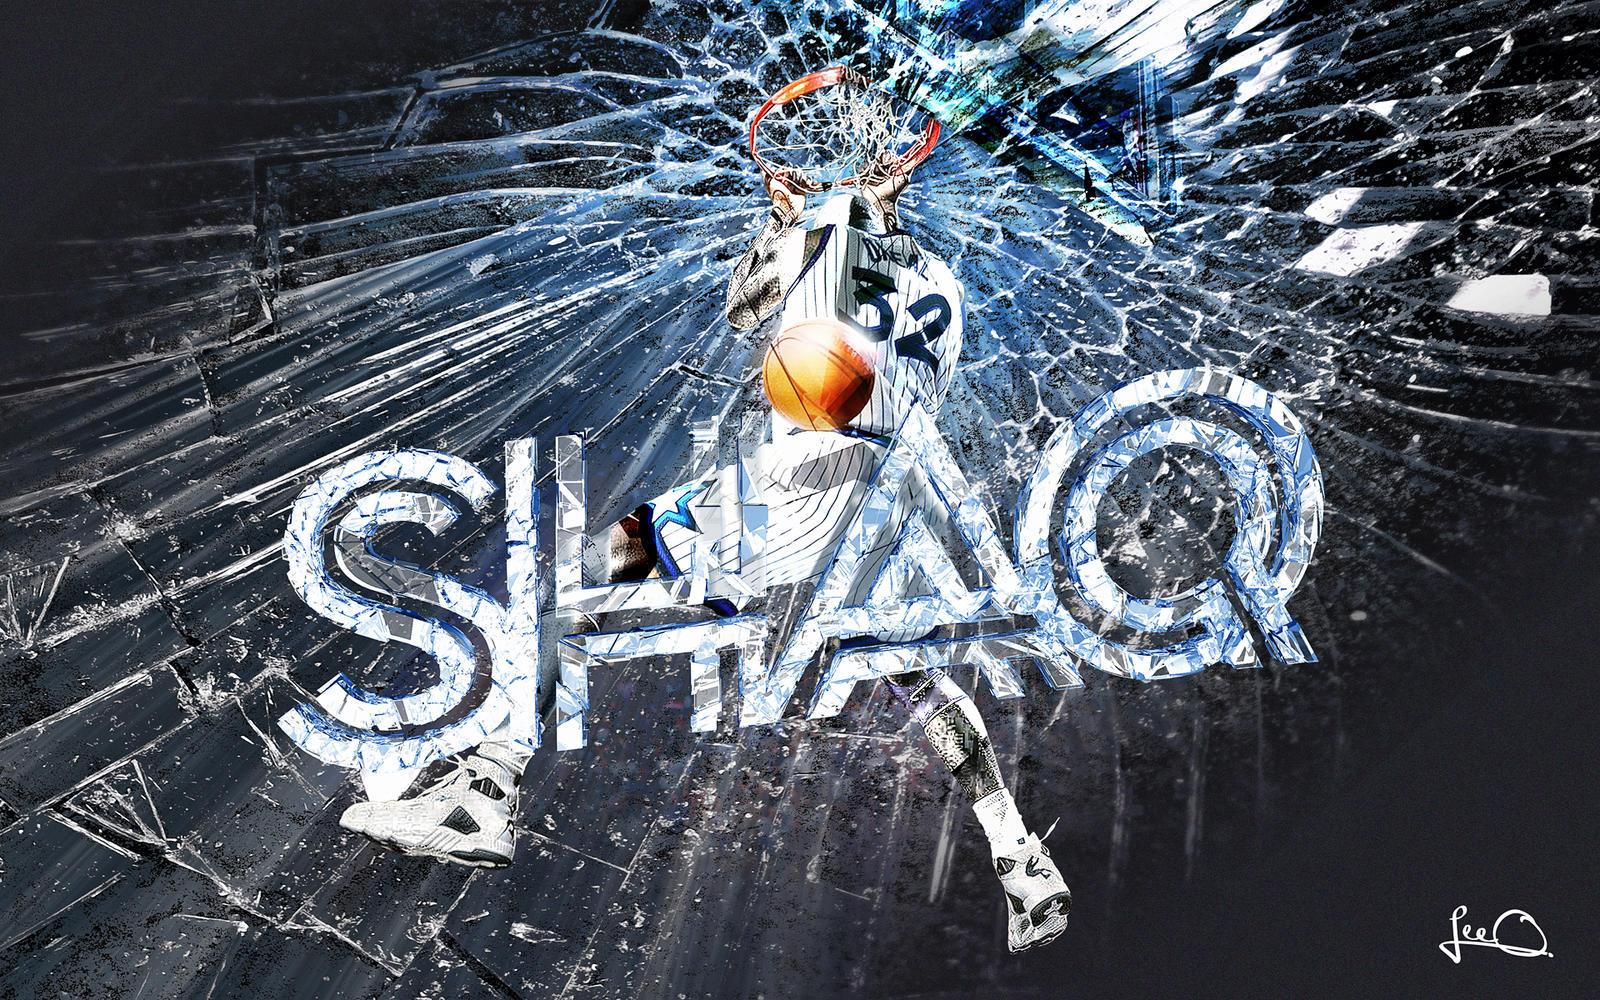 Shaq S First Car After Magic Deal